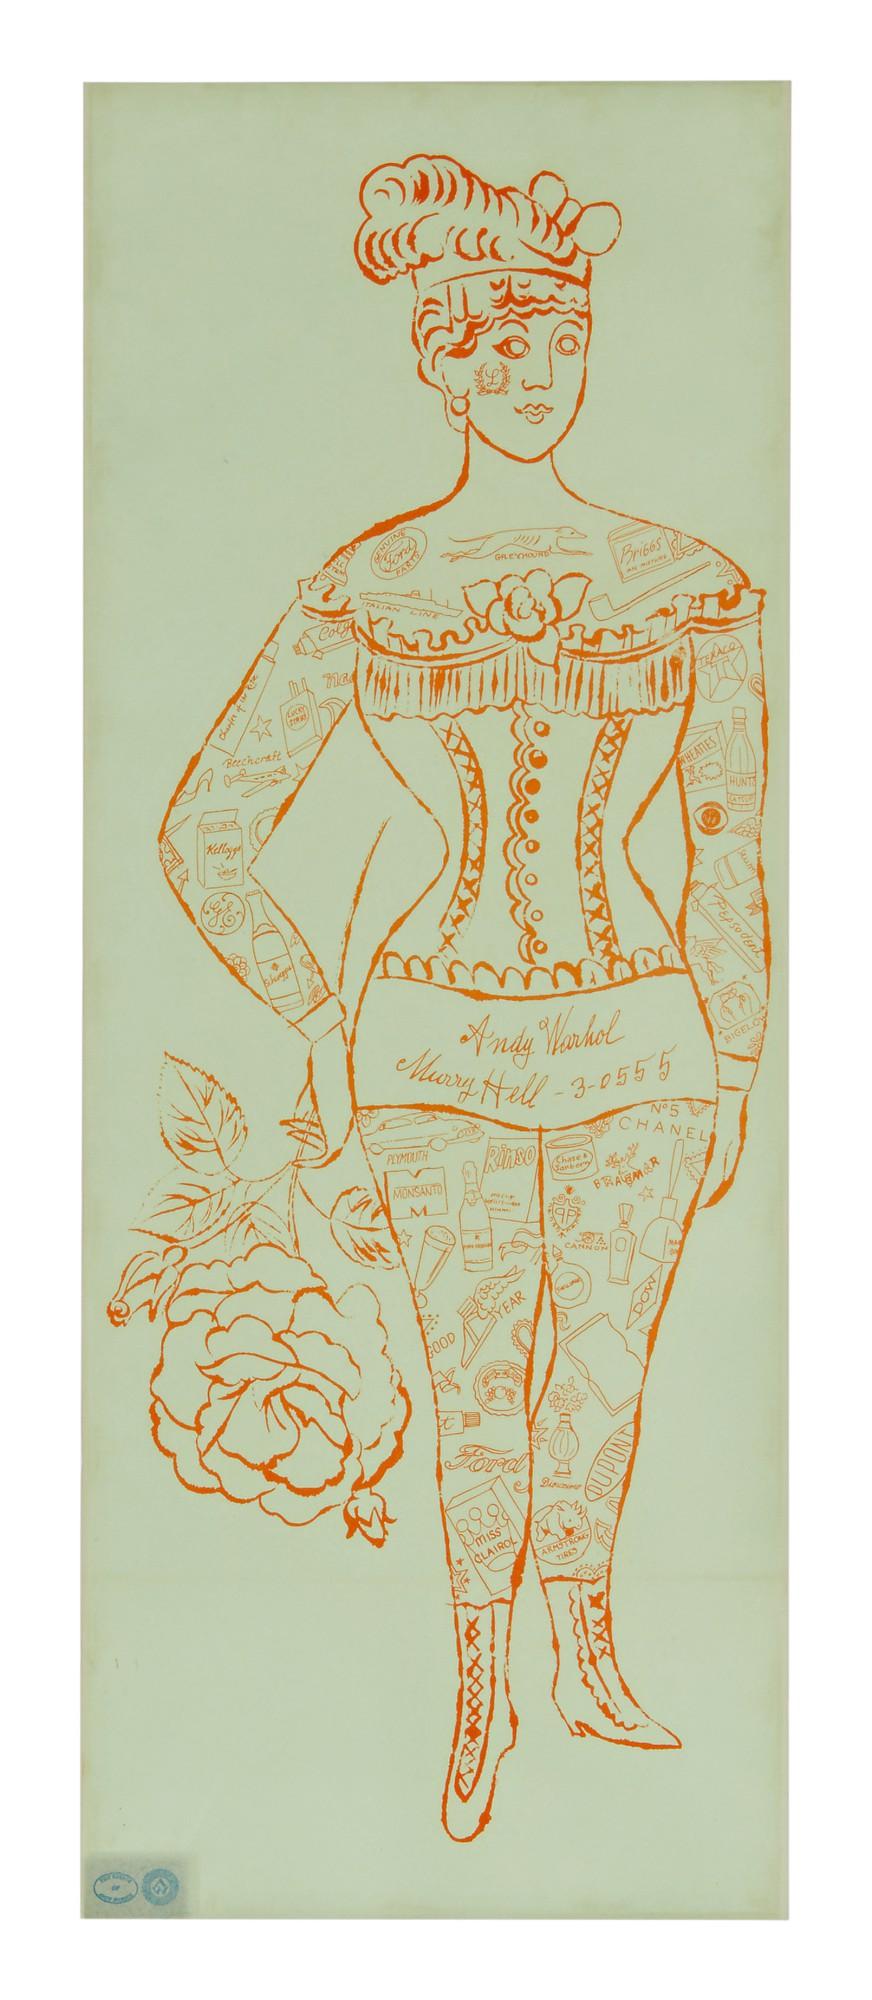 ANDY WARHOL | TATTOOED WOMAN HOLDING ROSE (NOT IN FELDMAN & SCHELLMANN)